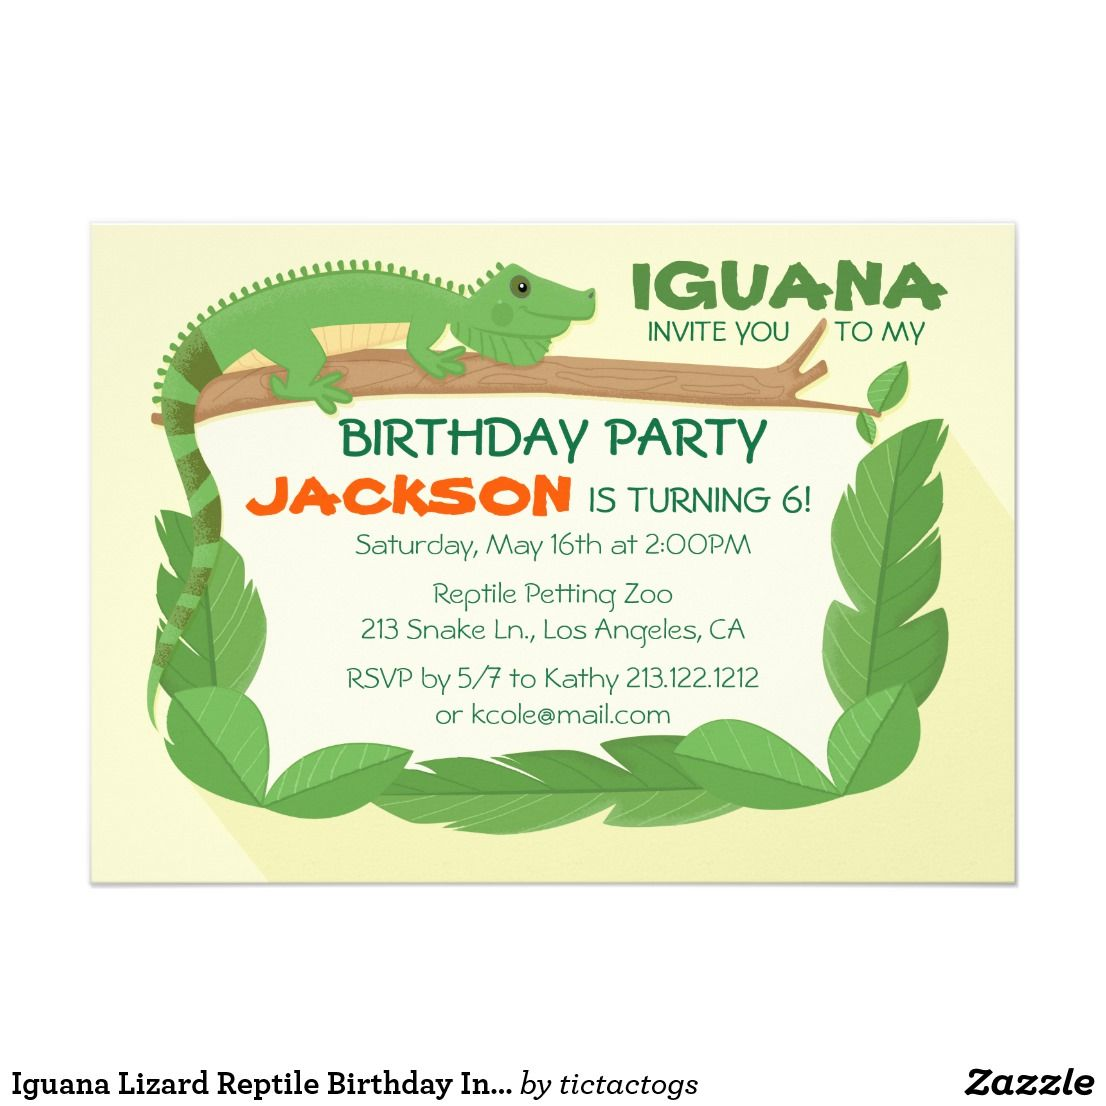 Iguana lizard reptile birthday invitation boys birthday party iguana lizard reptile birthday invitation filmwisefo